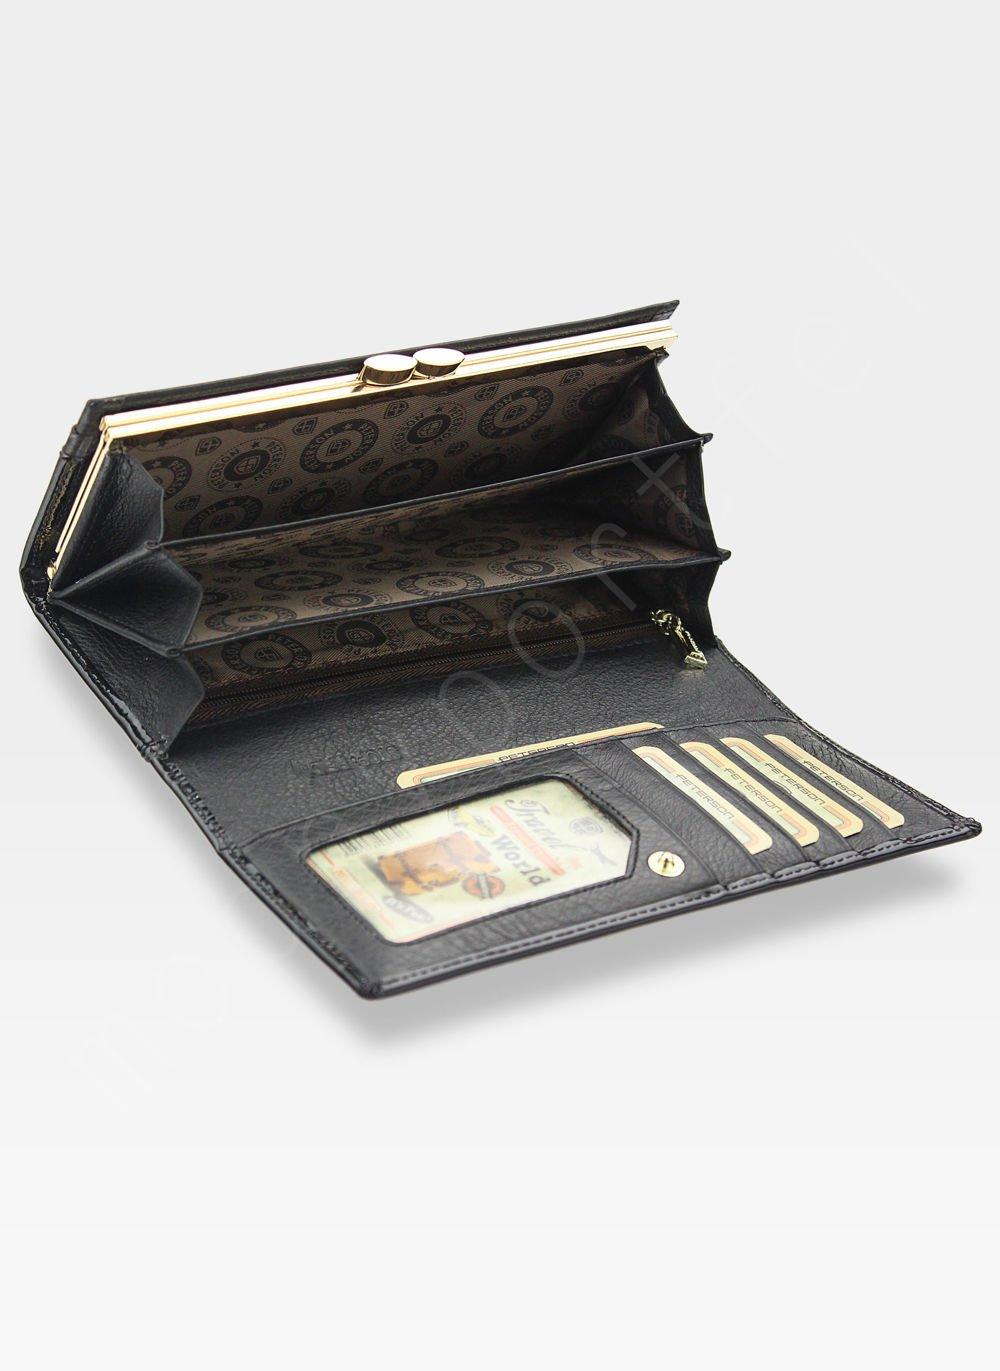 36959f4d5cbf3 Portfel Damski Skórzany PETERSON Duży Elegancki Pojemny System RFID ...